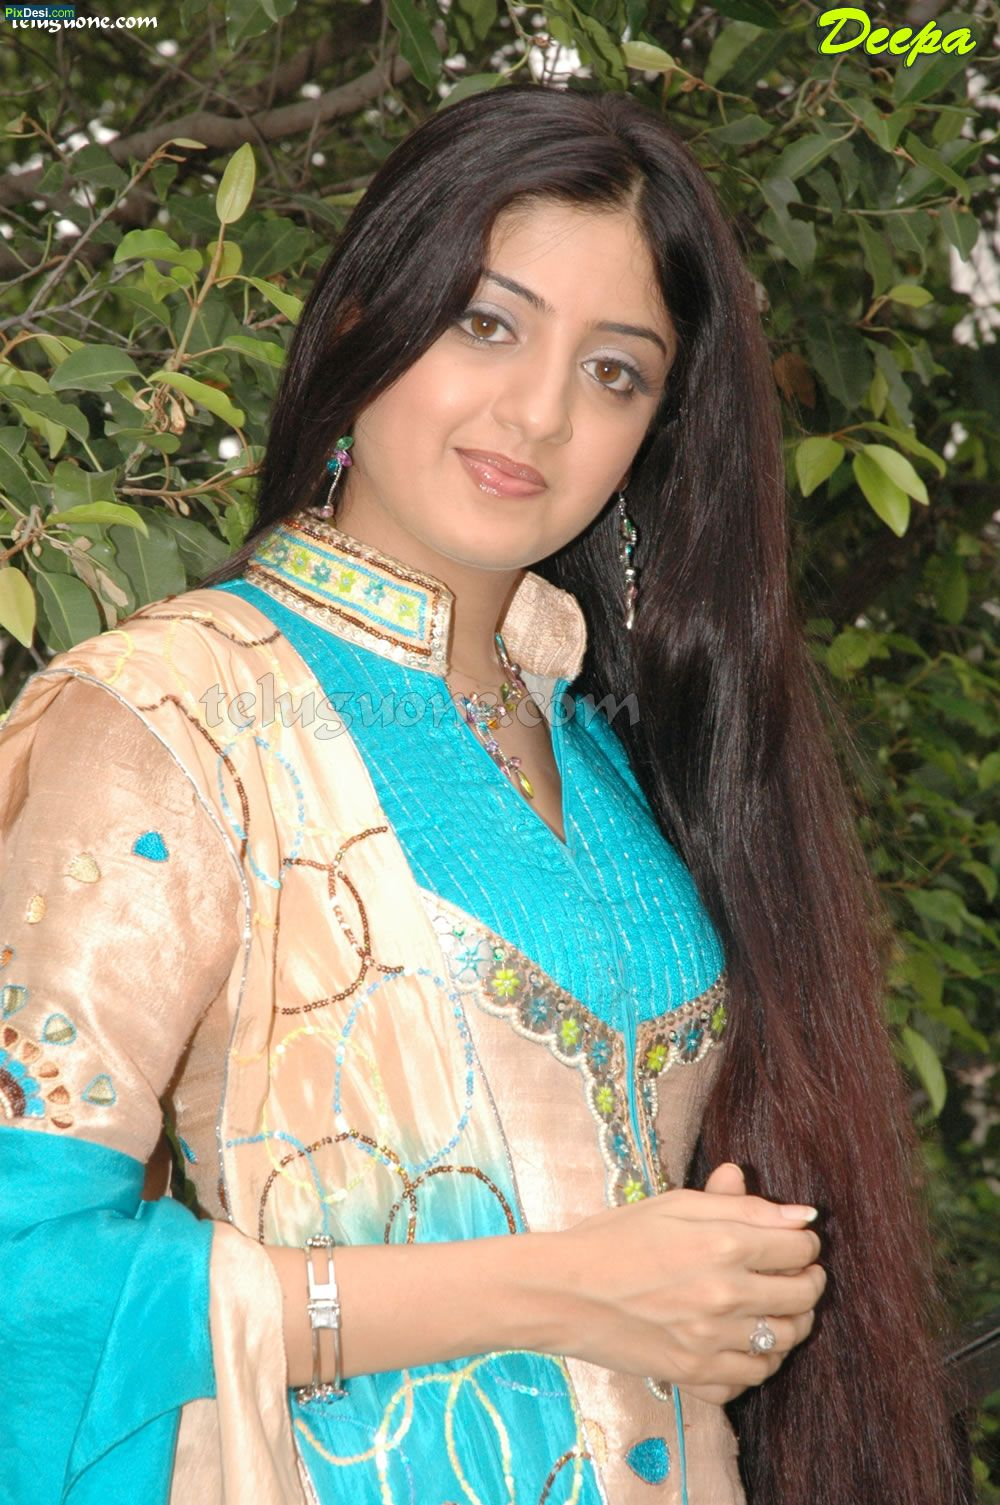 Manhar 39 s world rabia pic - Indian nice girl wallpaper ...